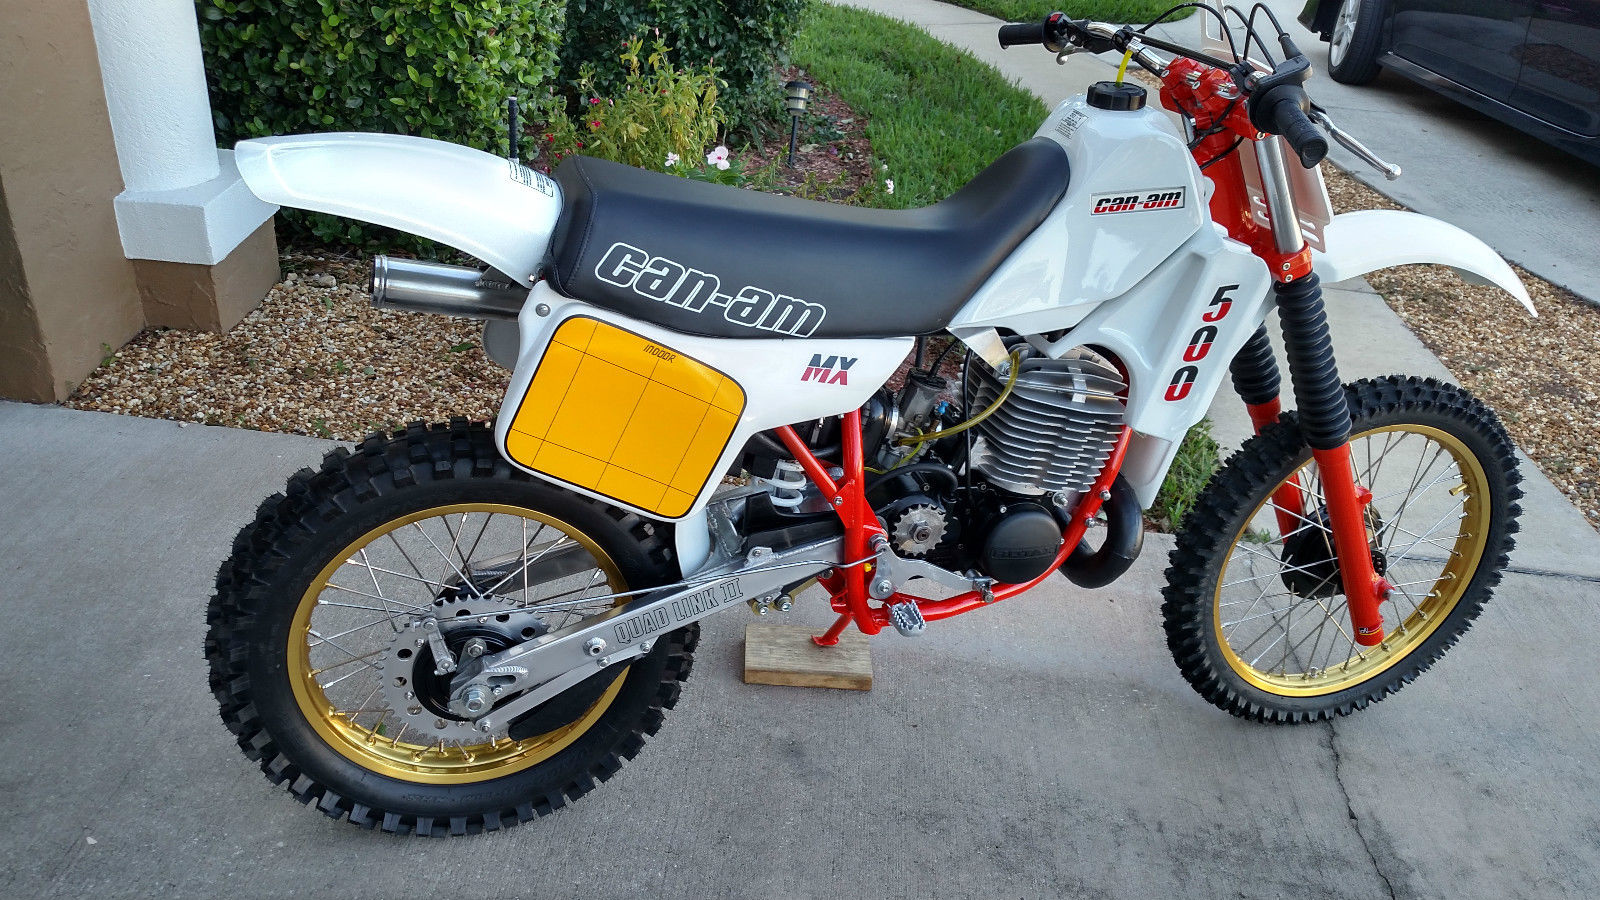 1985 Yamaha Virago Motorcycles for sale